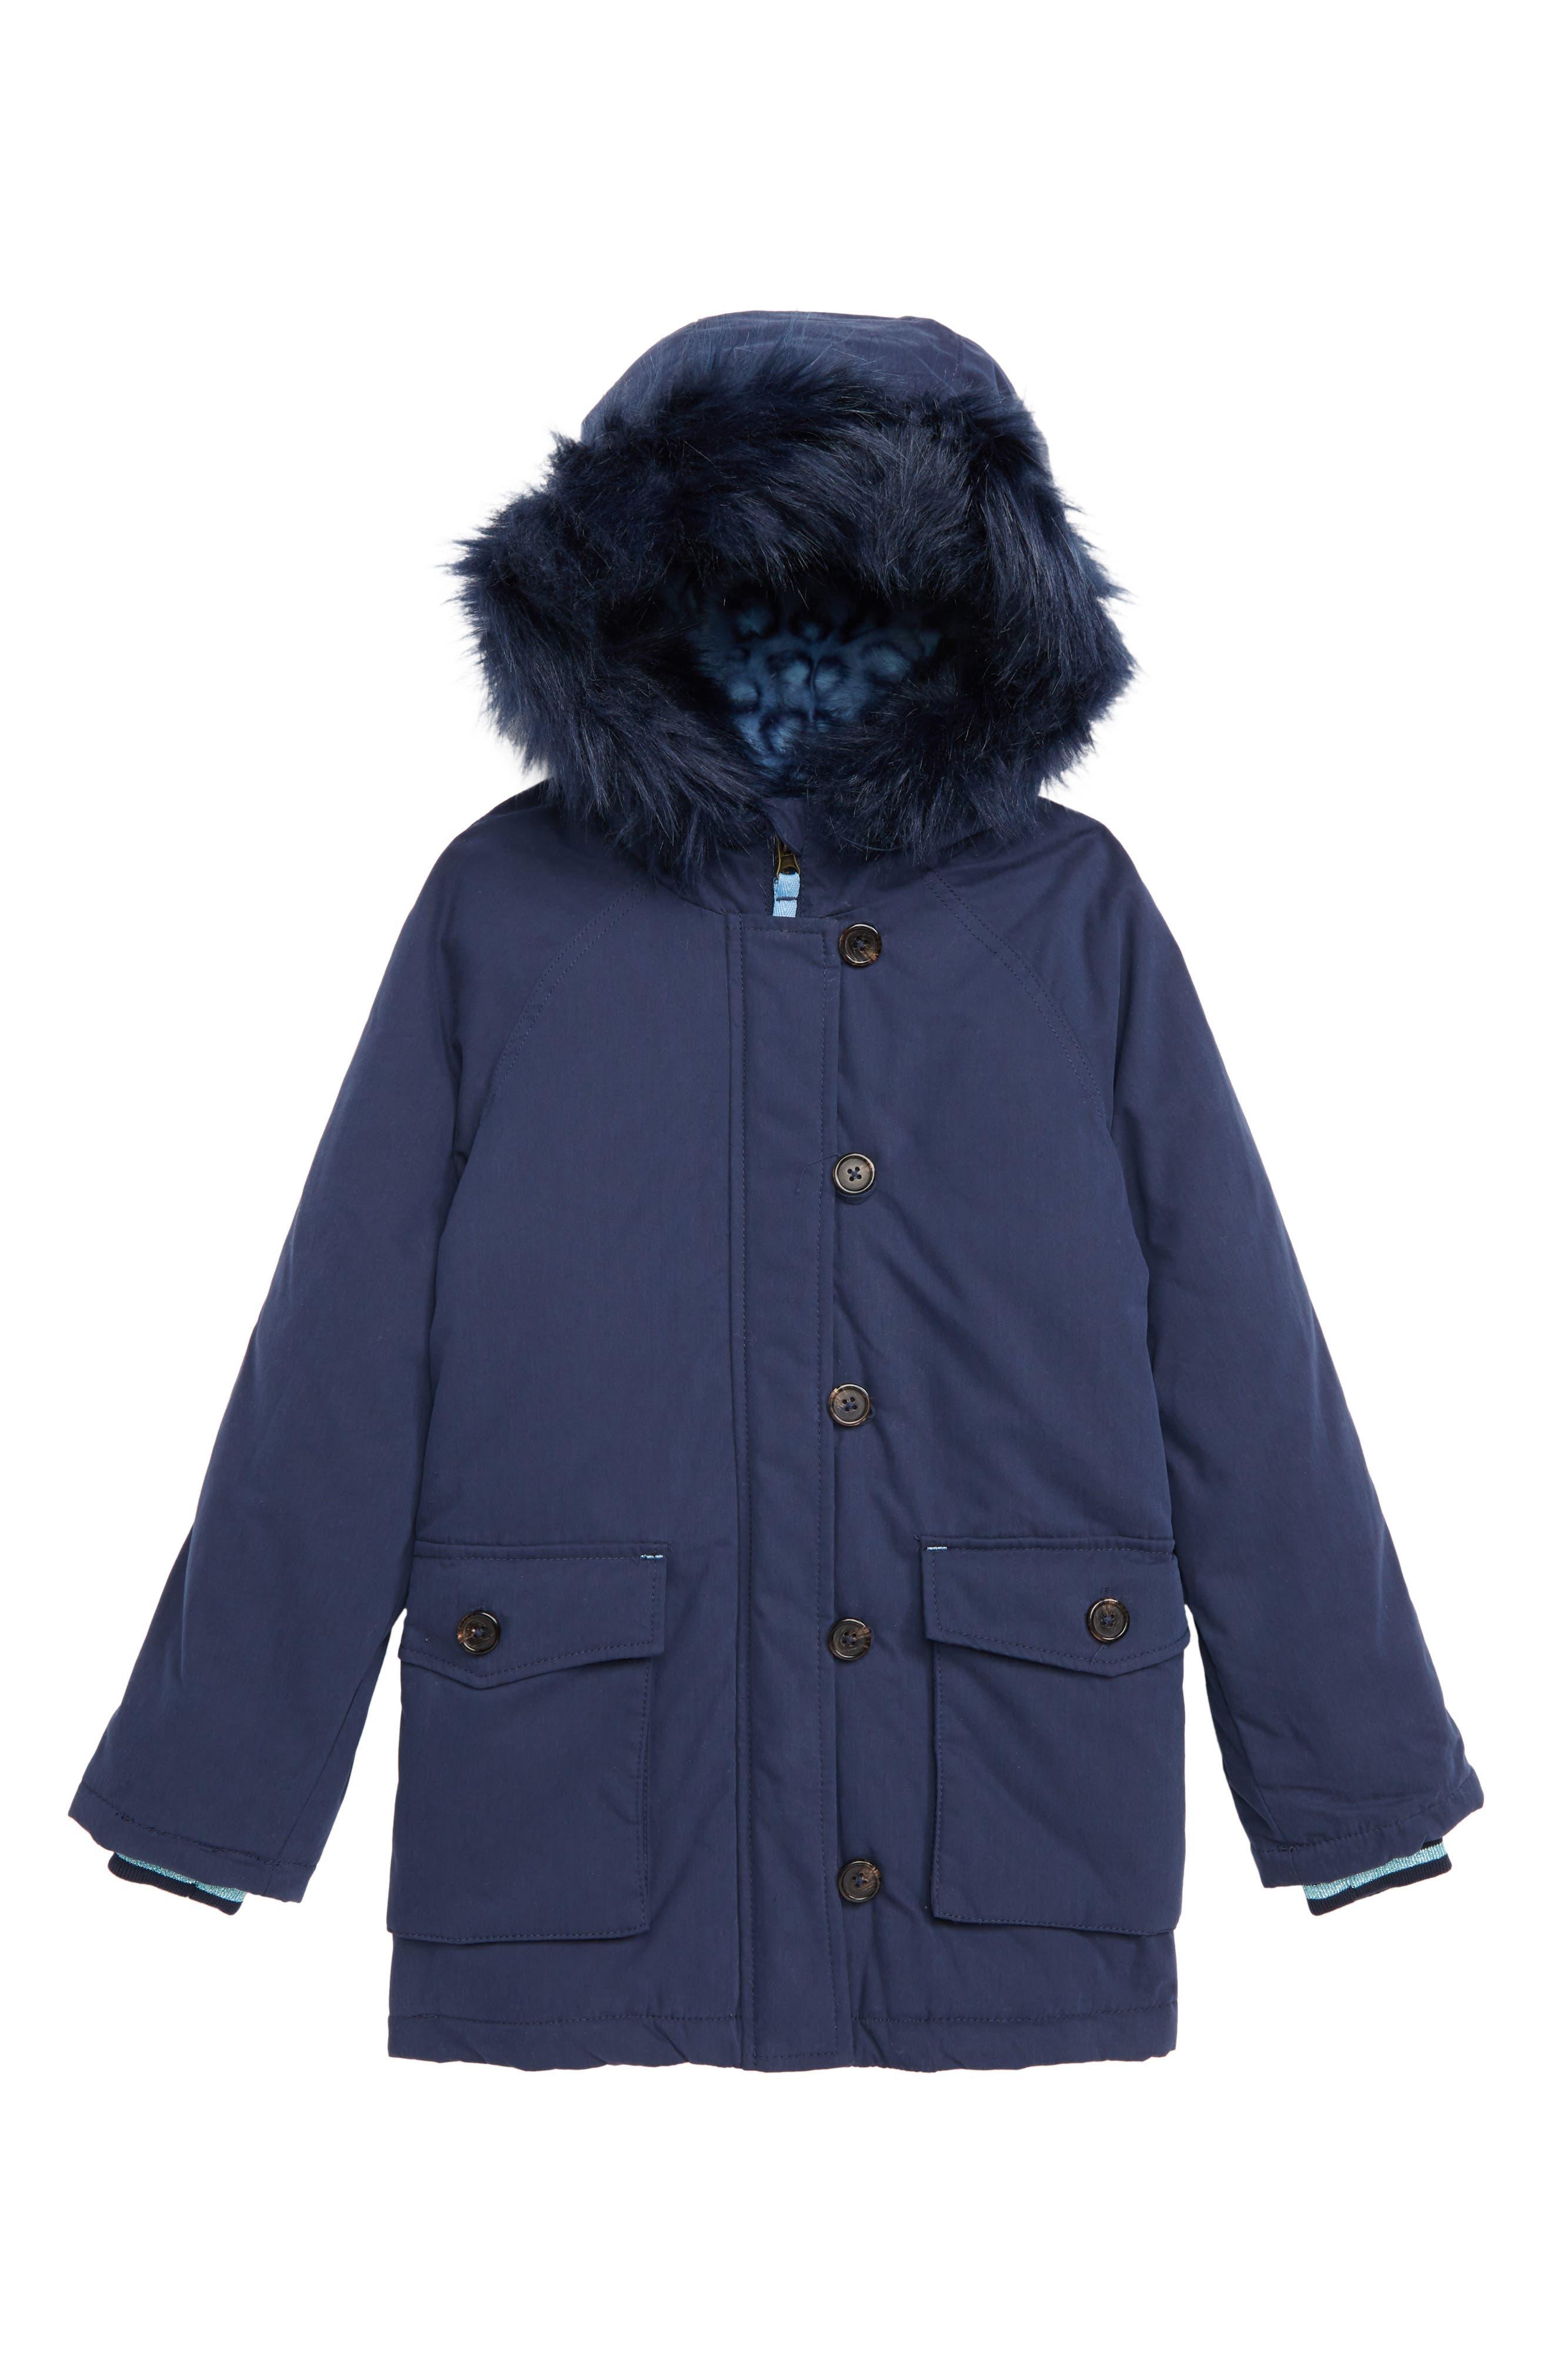 Mini Boden Kids Coats Jackets Nordstrom